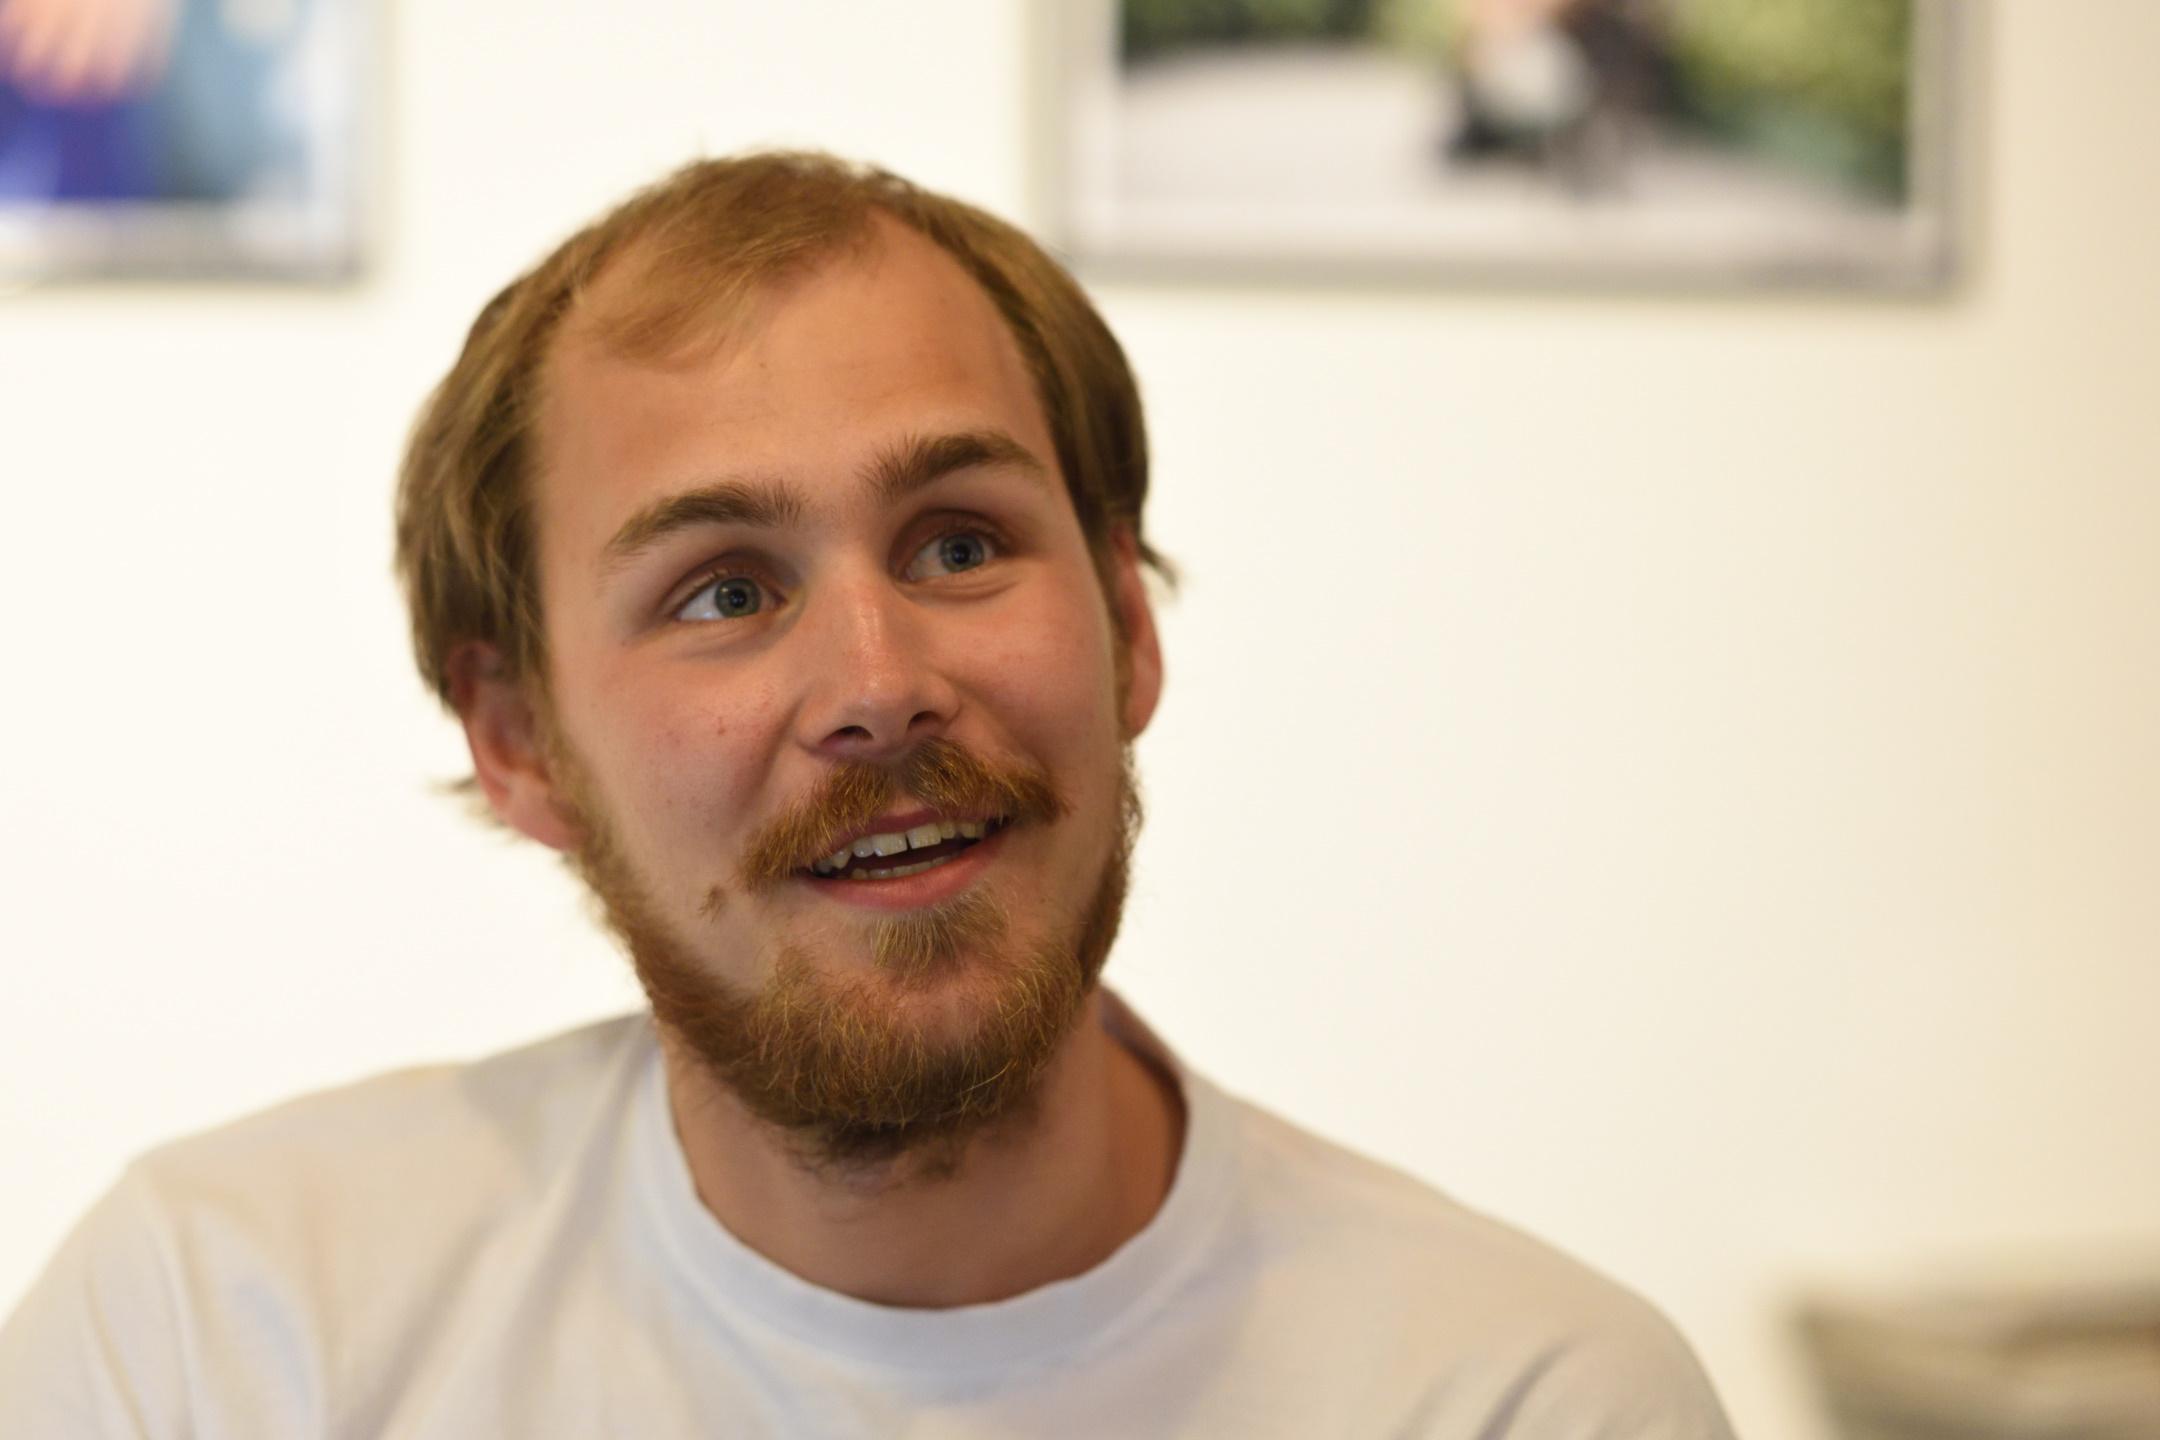 2017-06-11 Emil Gyllenberg i gamla stan - foto: Magnus Norden